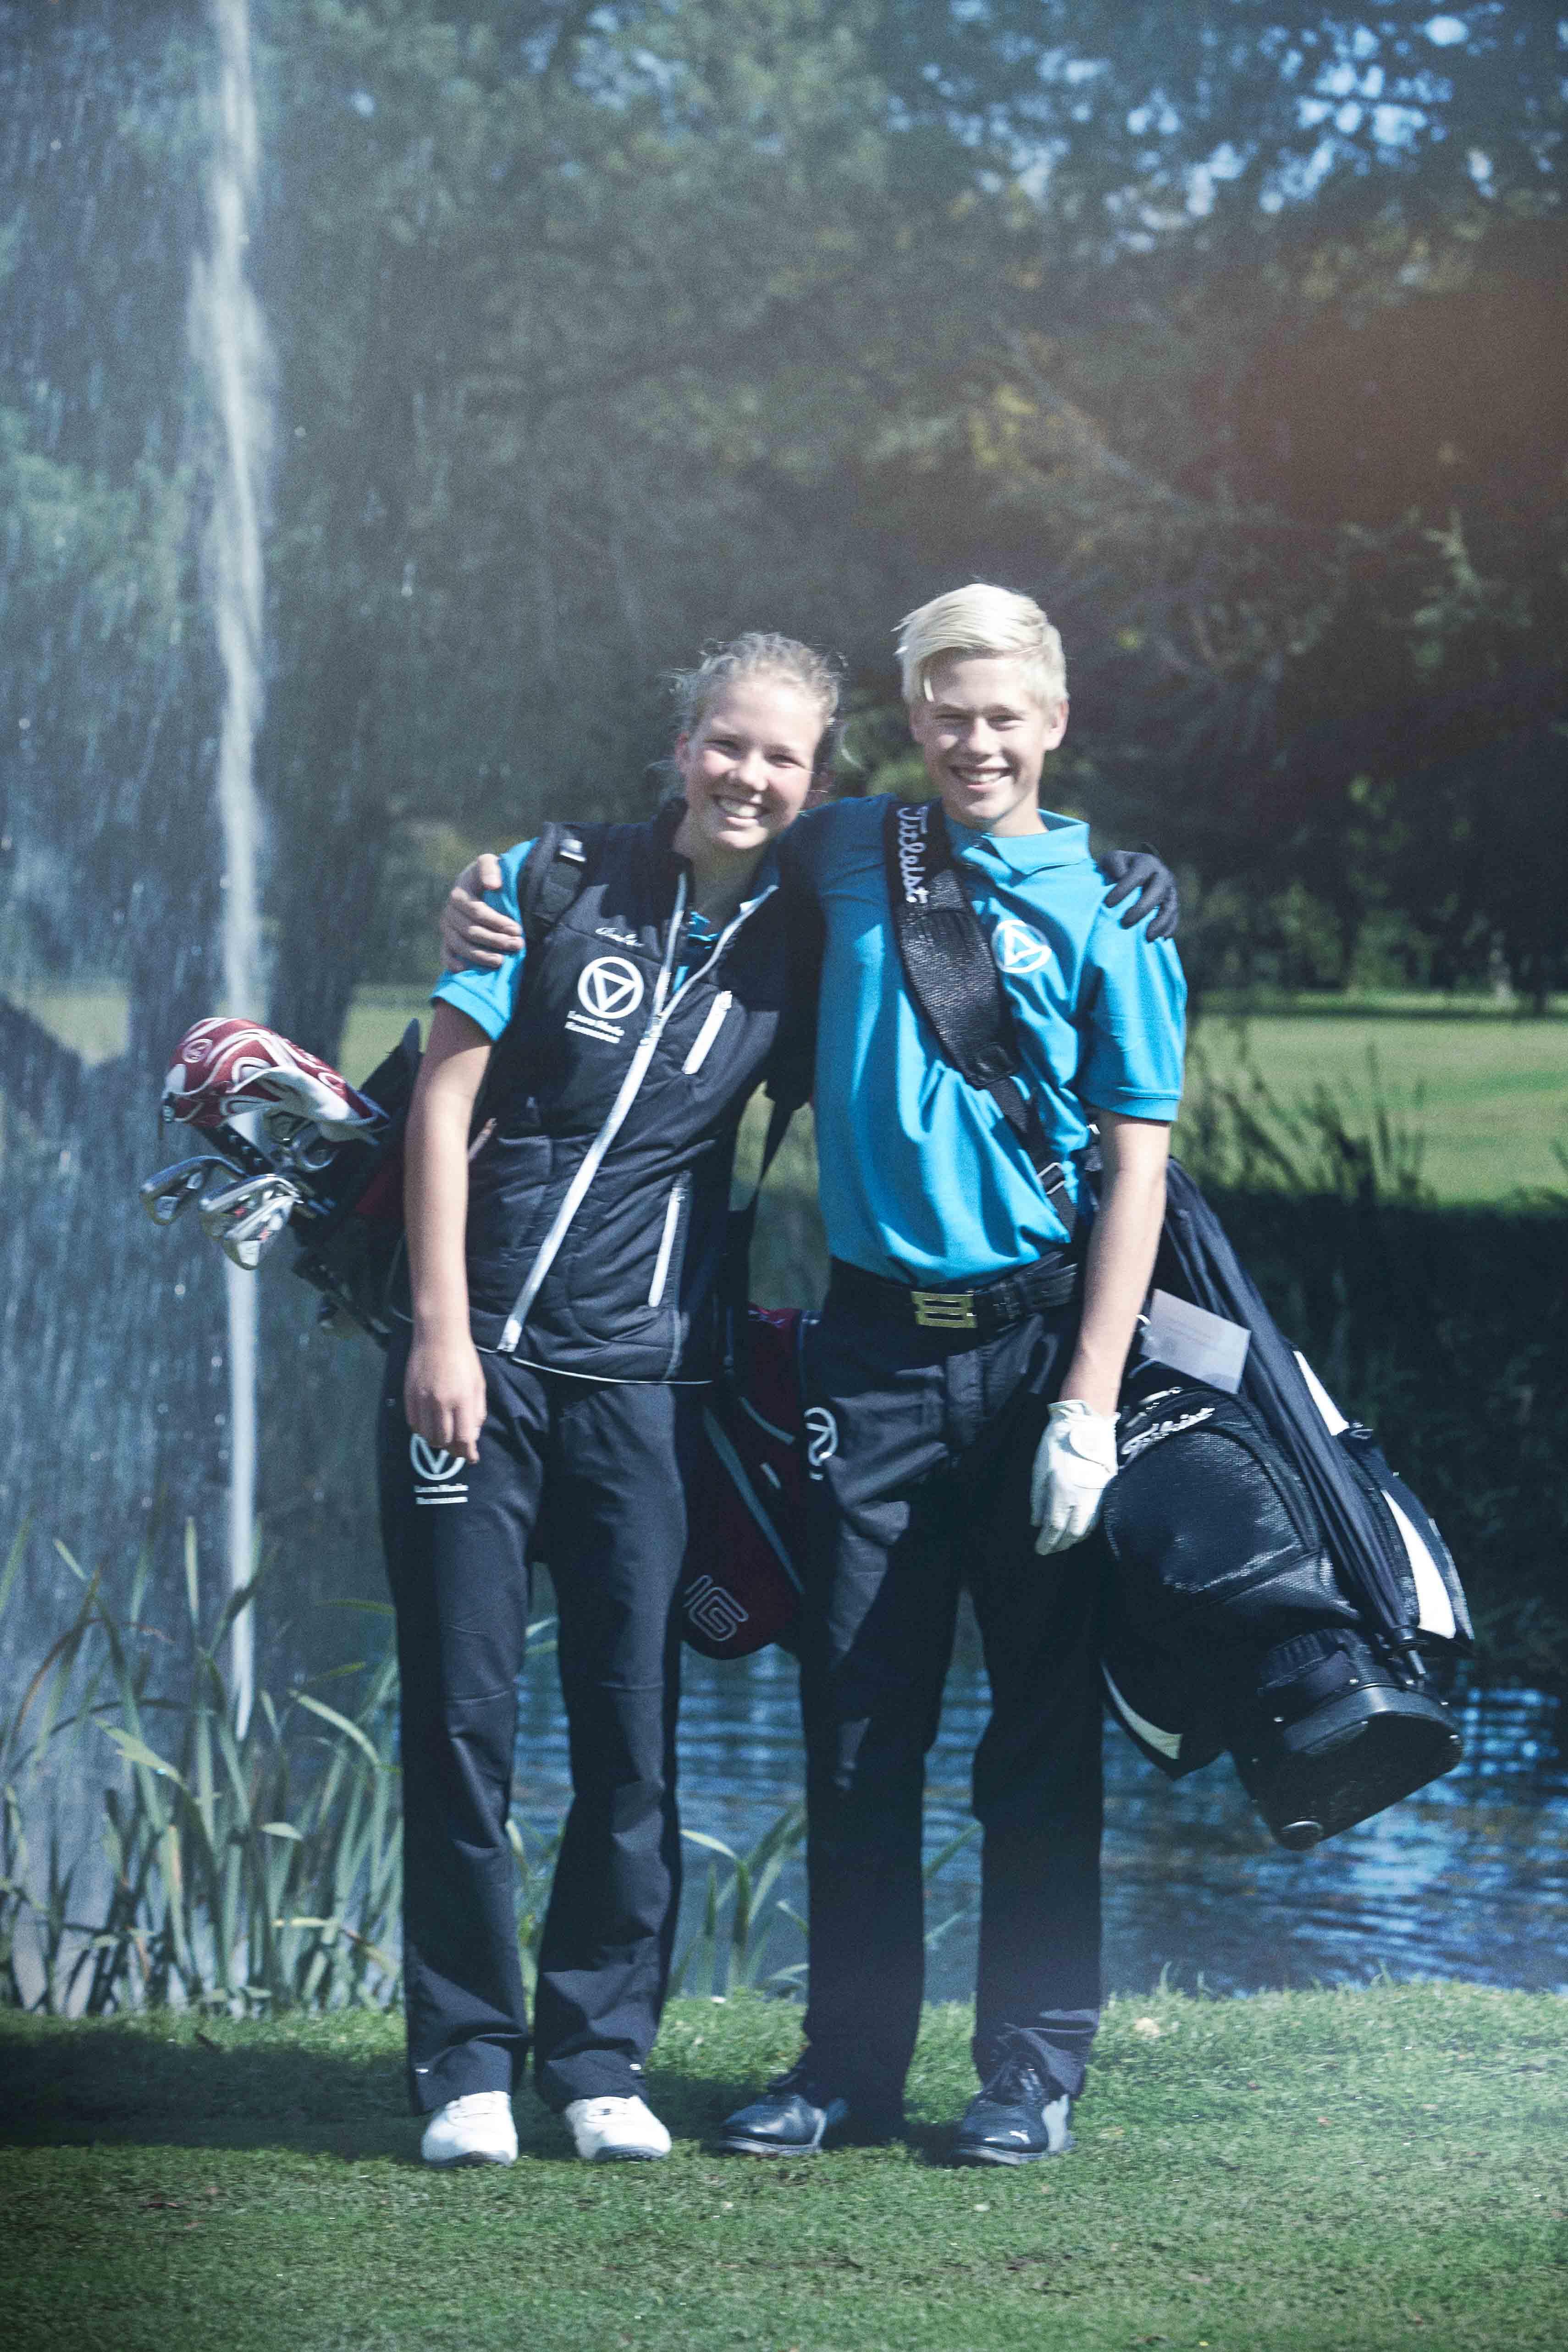 golf efterskole jylland